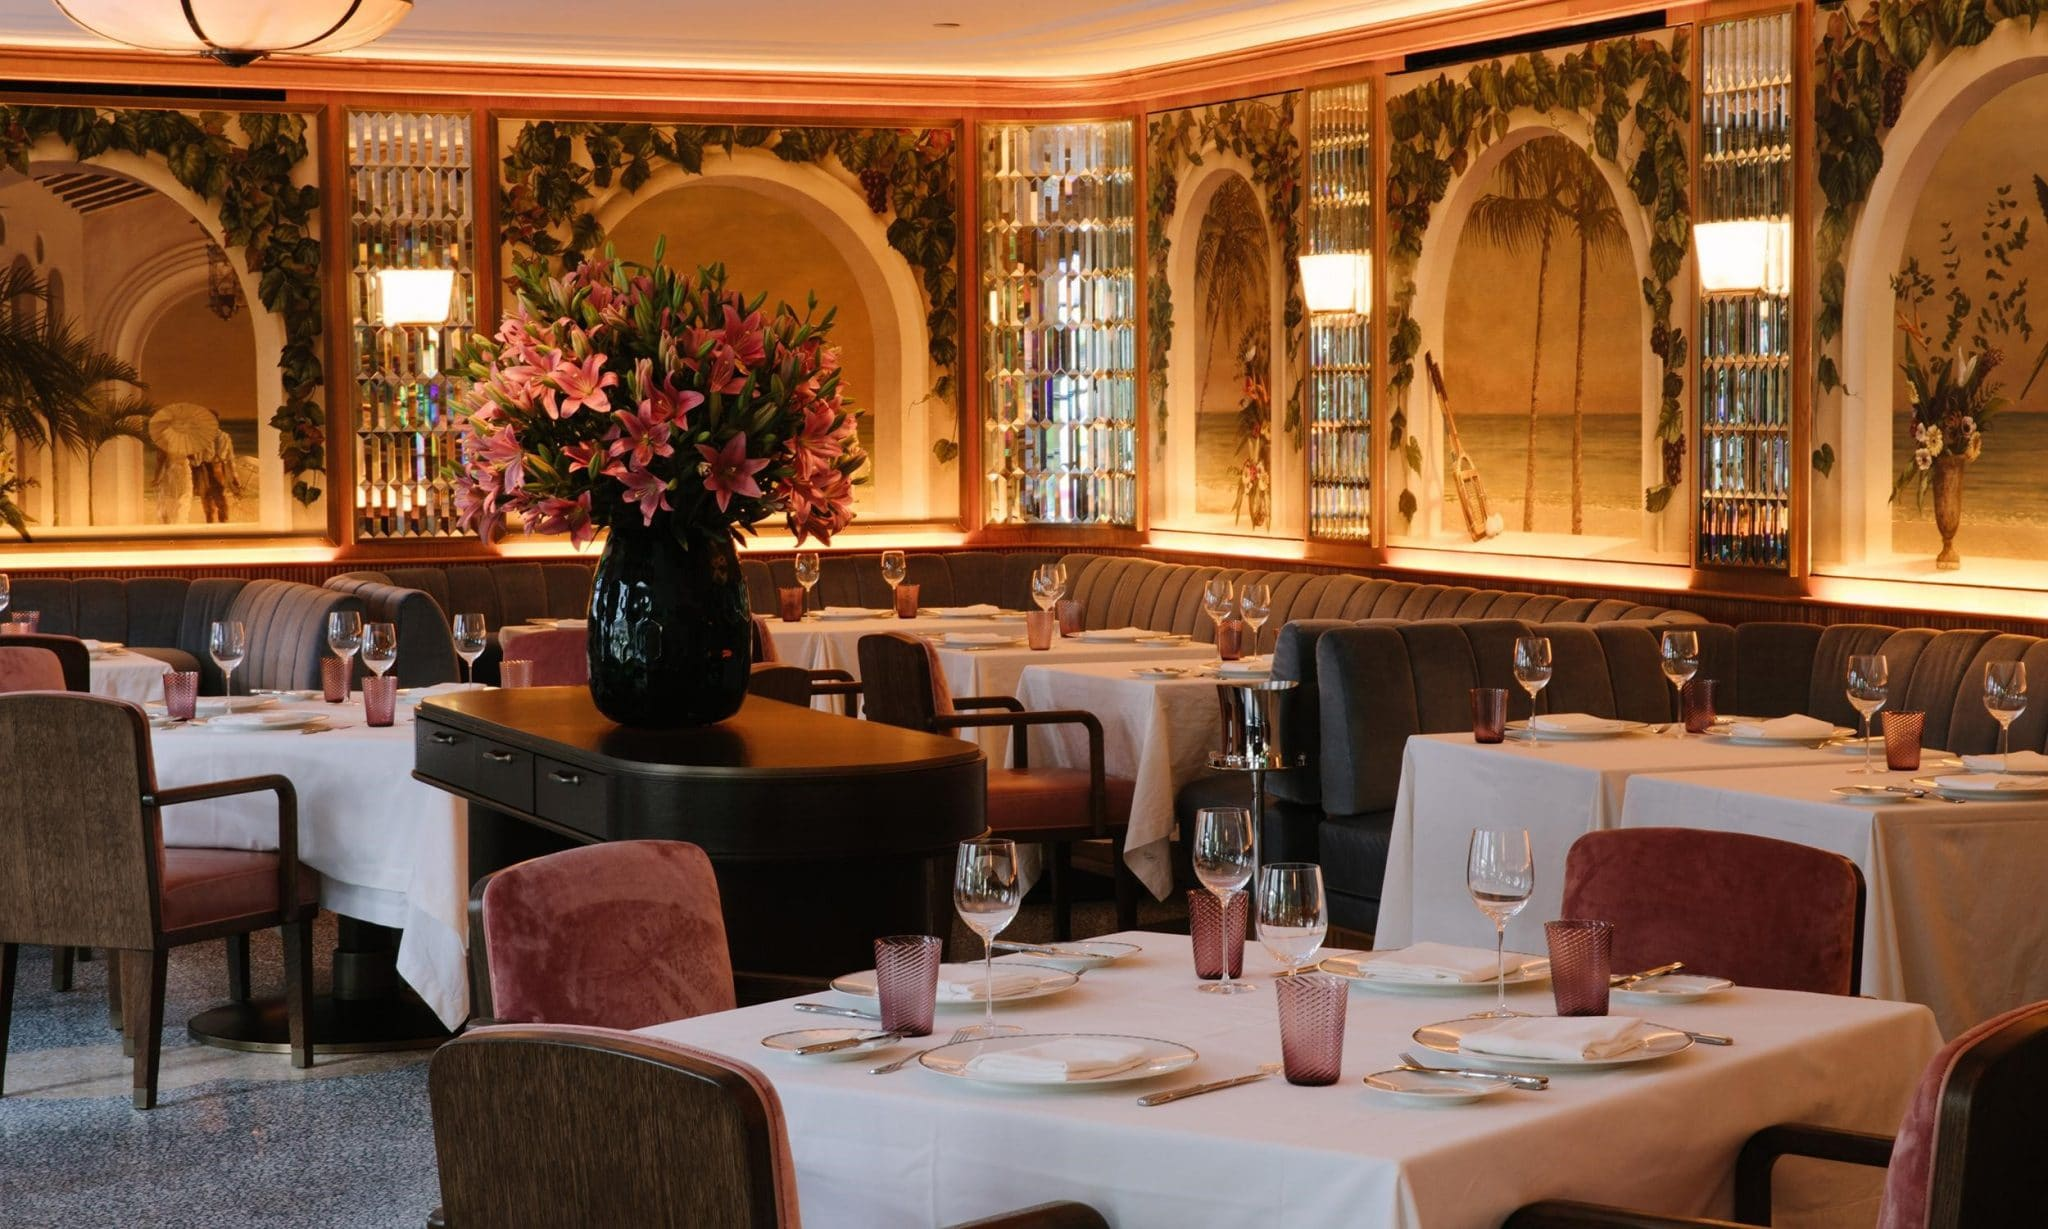 Le restaurant Per Se de Thomas Keller à New York